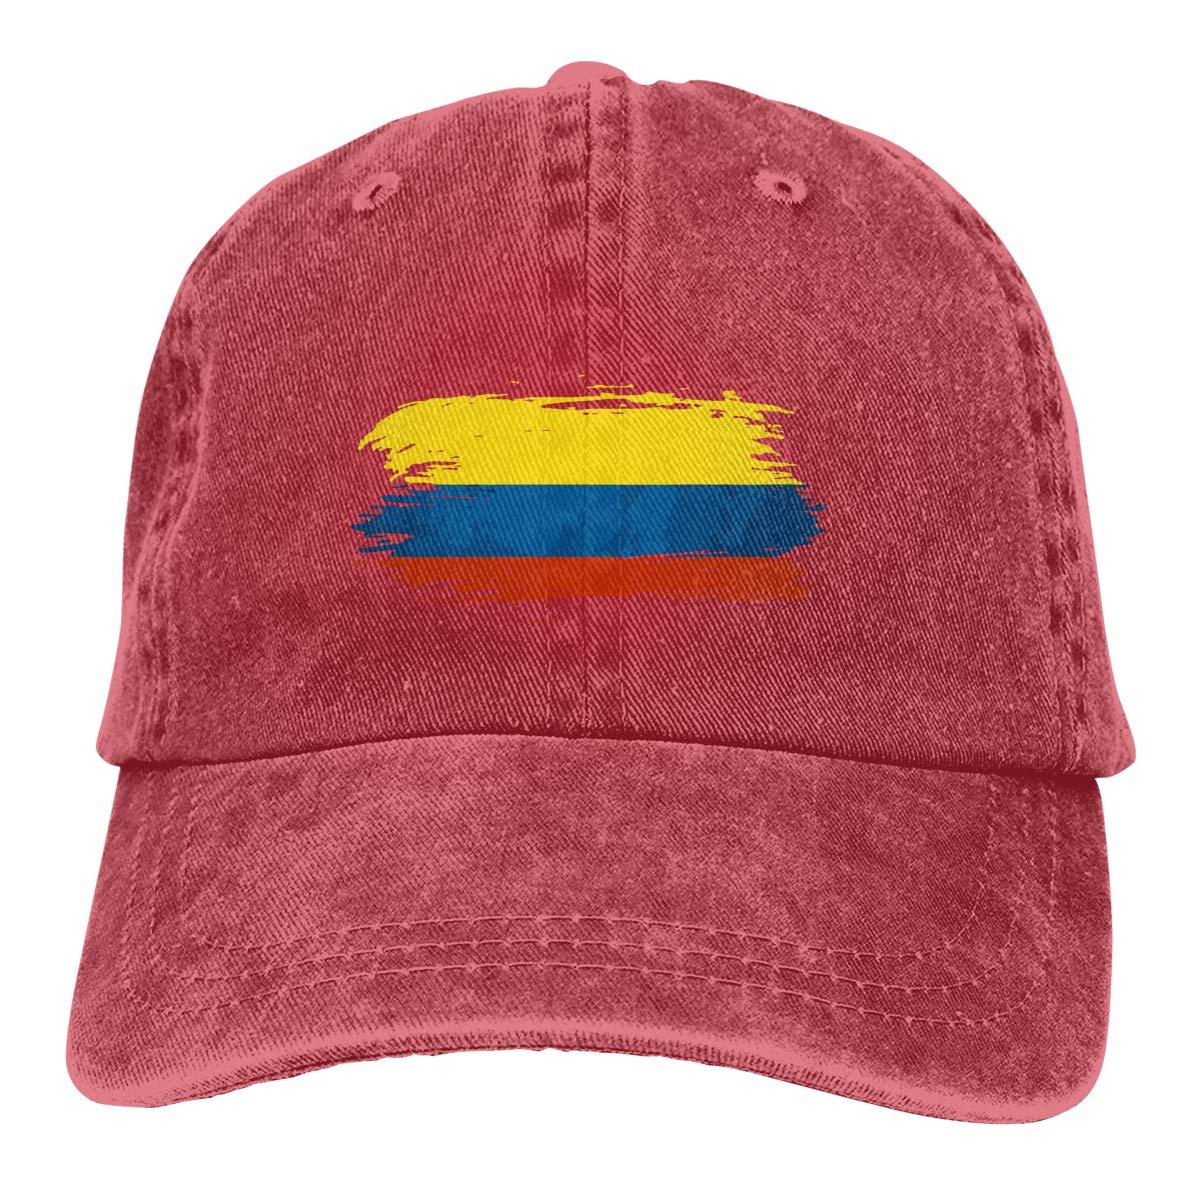 PMGM-C Colombia Flag Adult Personalize Jeans Hip Hop Cap Adjustable Baseball Cap